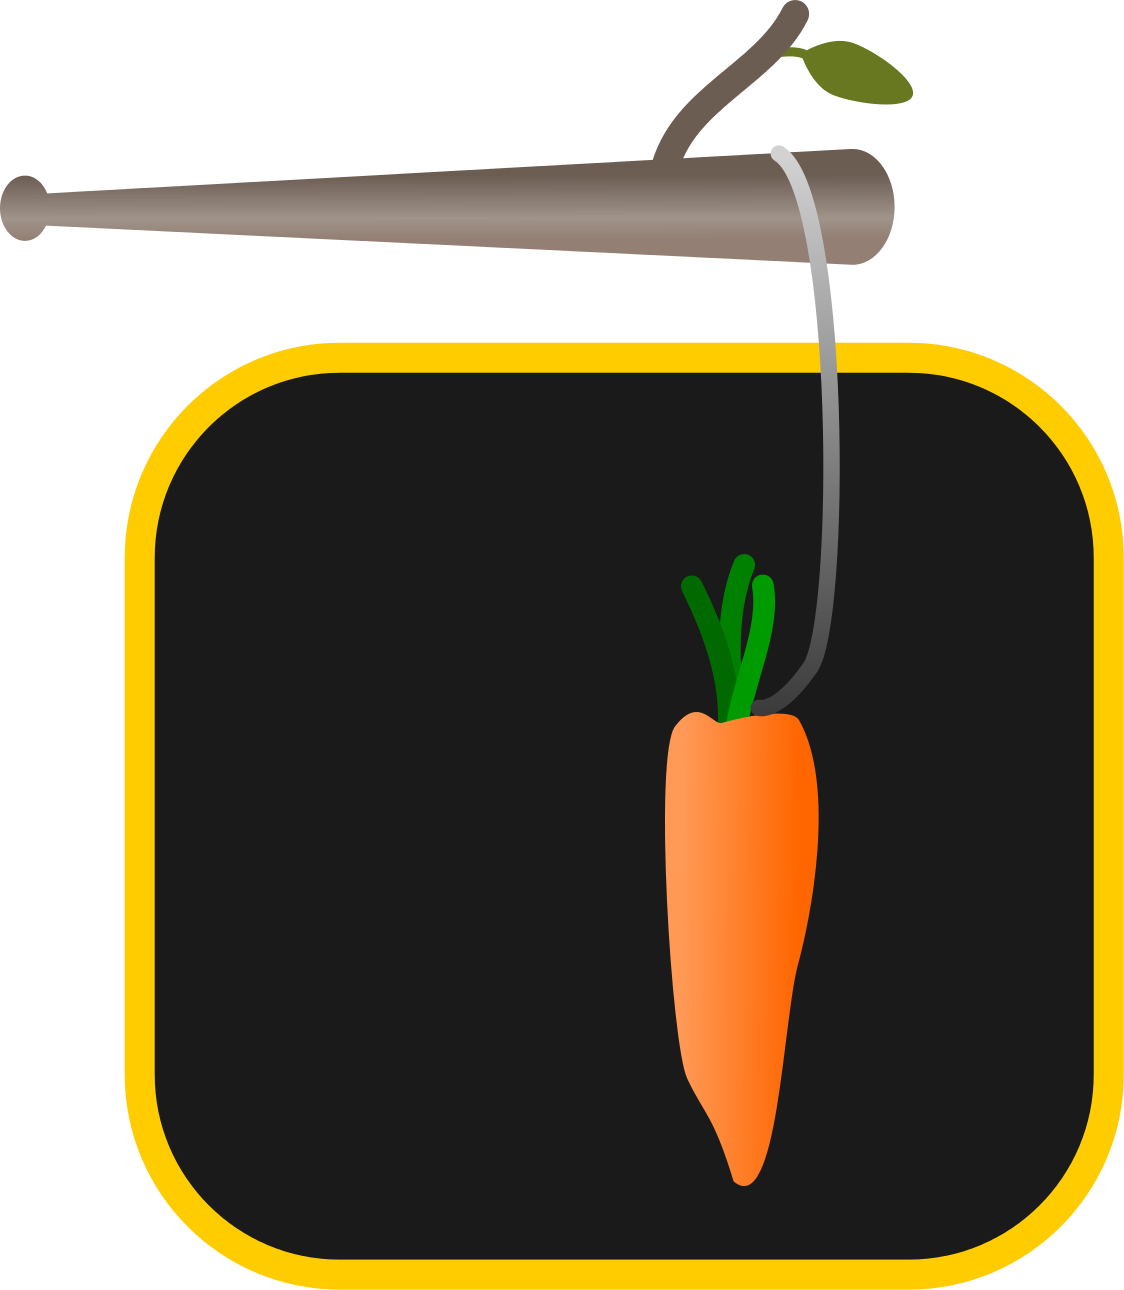 vegetables clipart carrot stick